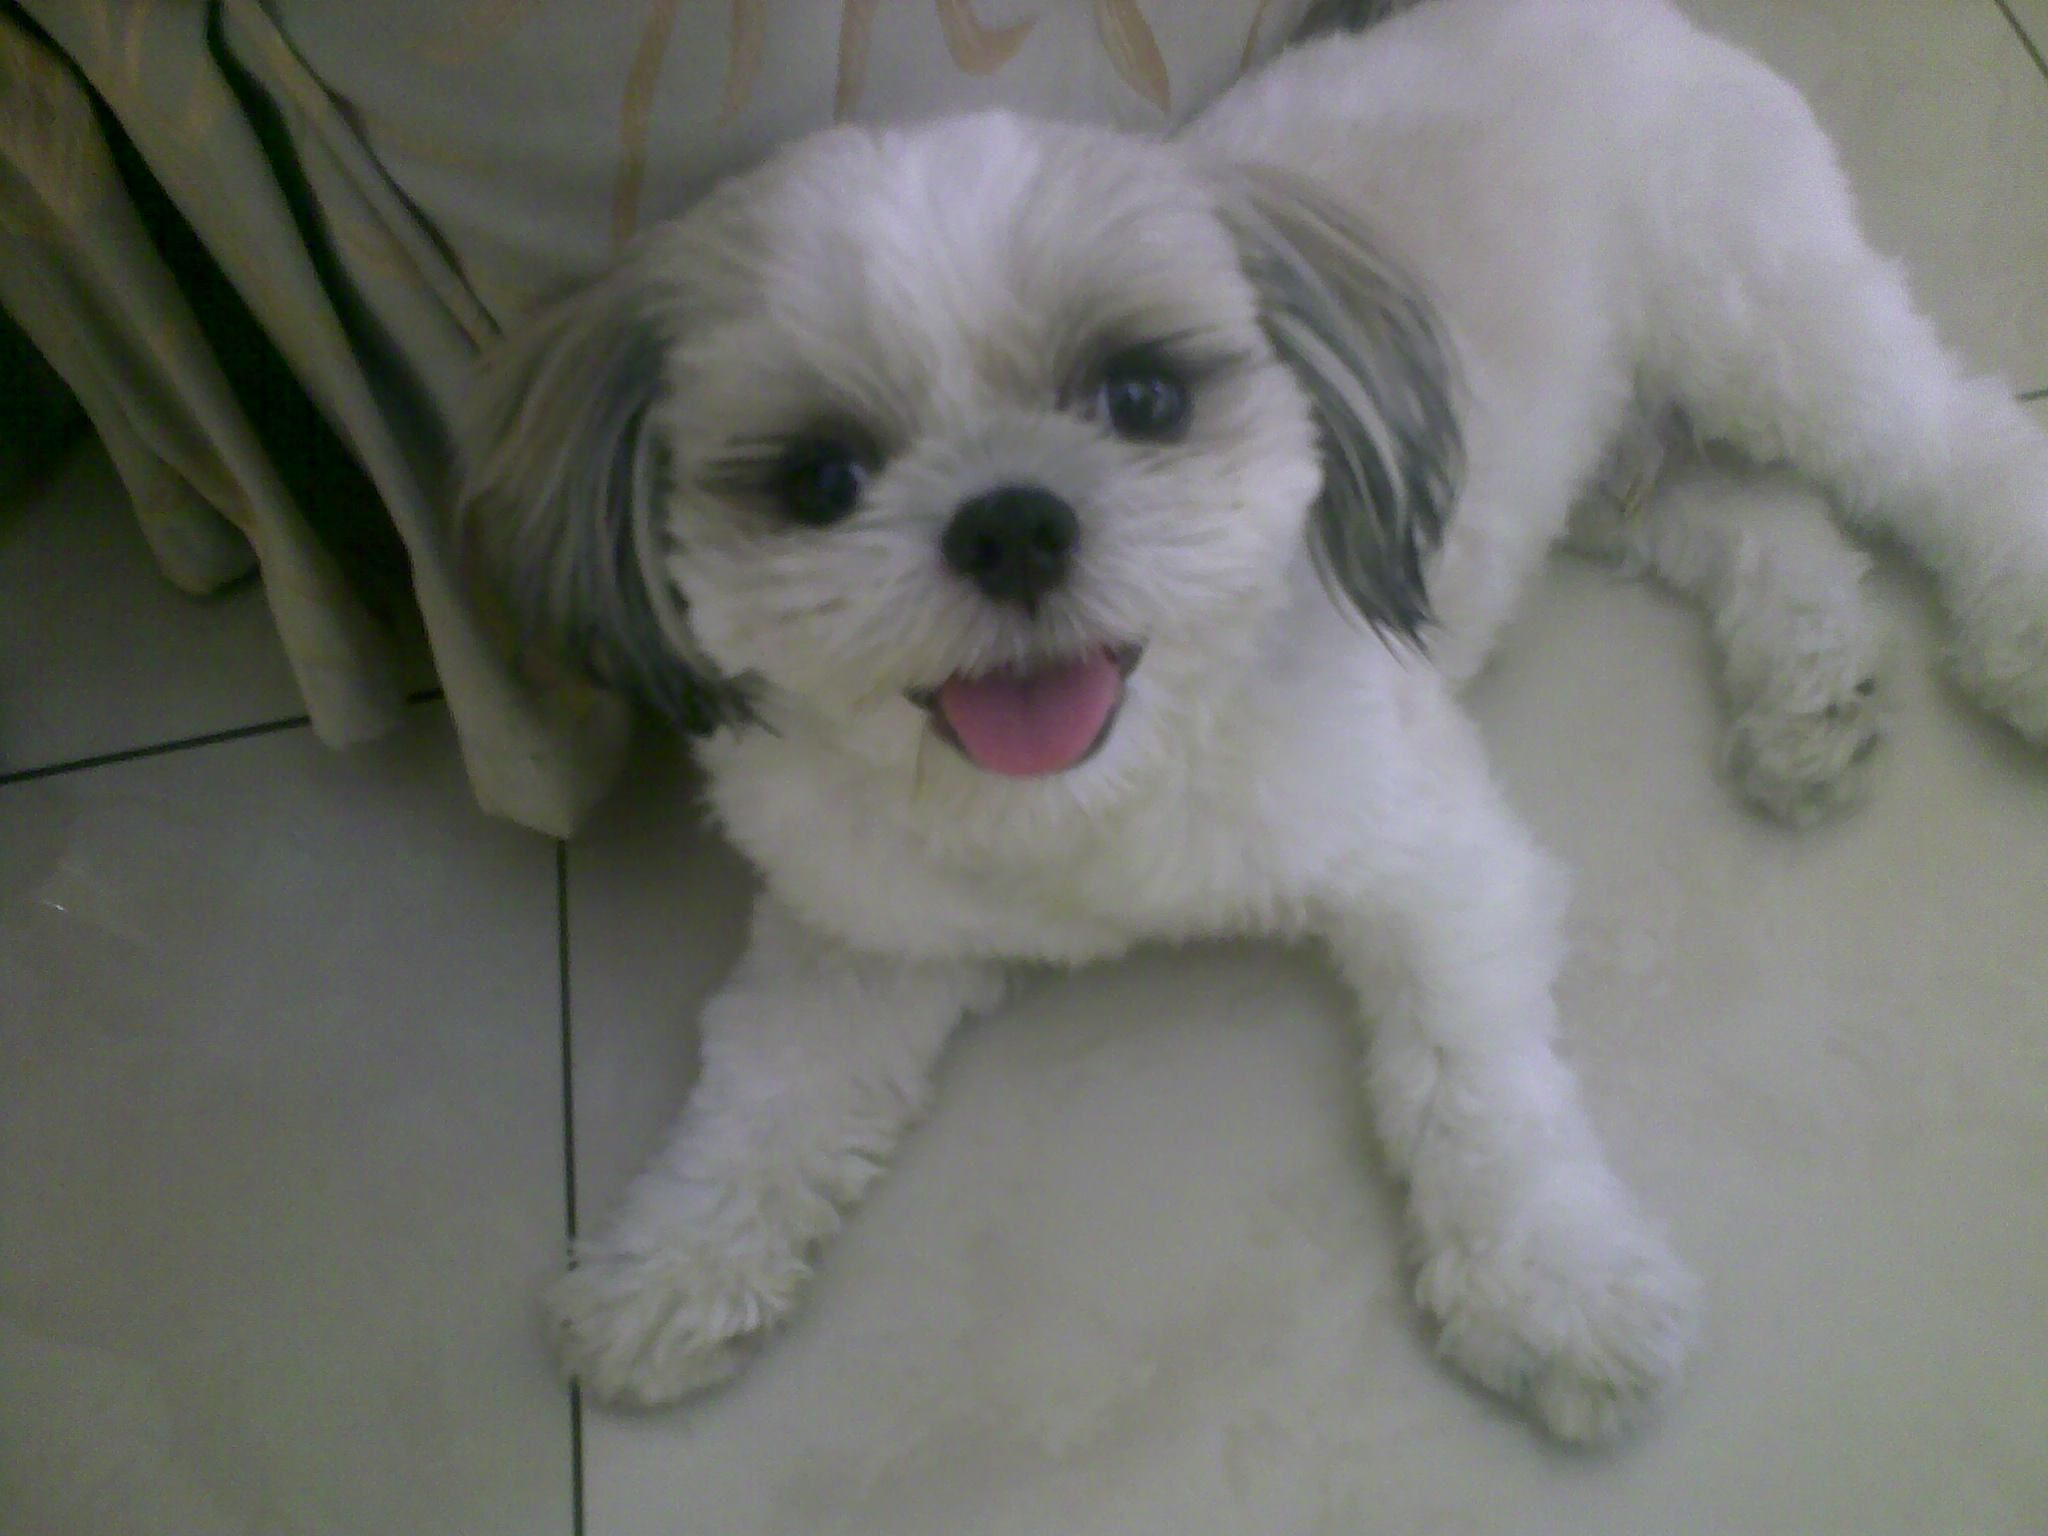 Shih Tzu 360 Degrees Of Me Shih Tzu Shih Tzu Puppy Haircuts